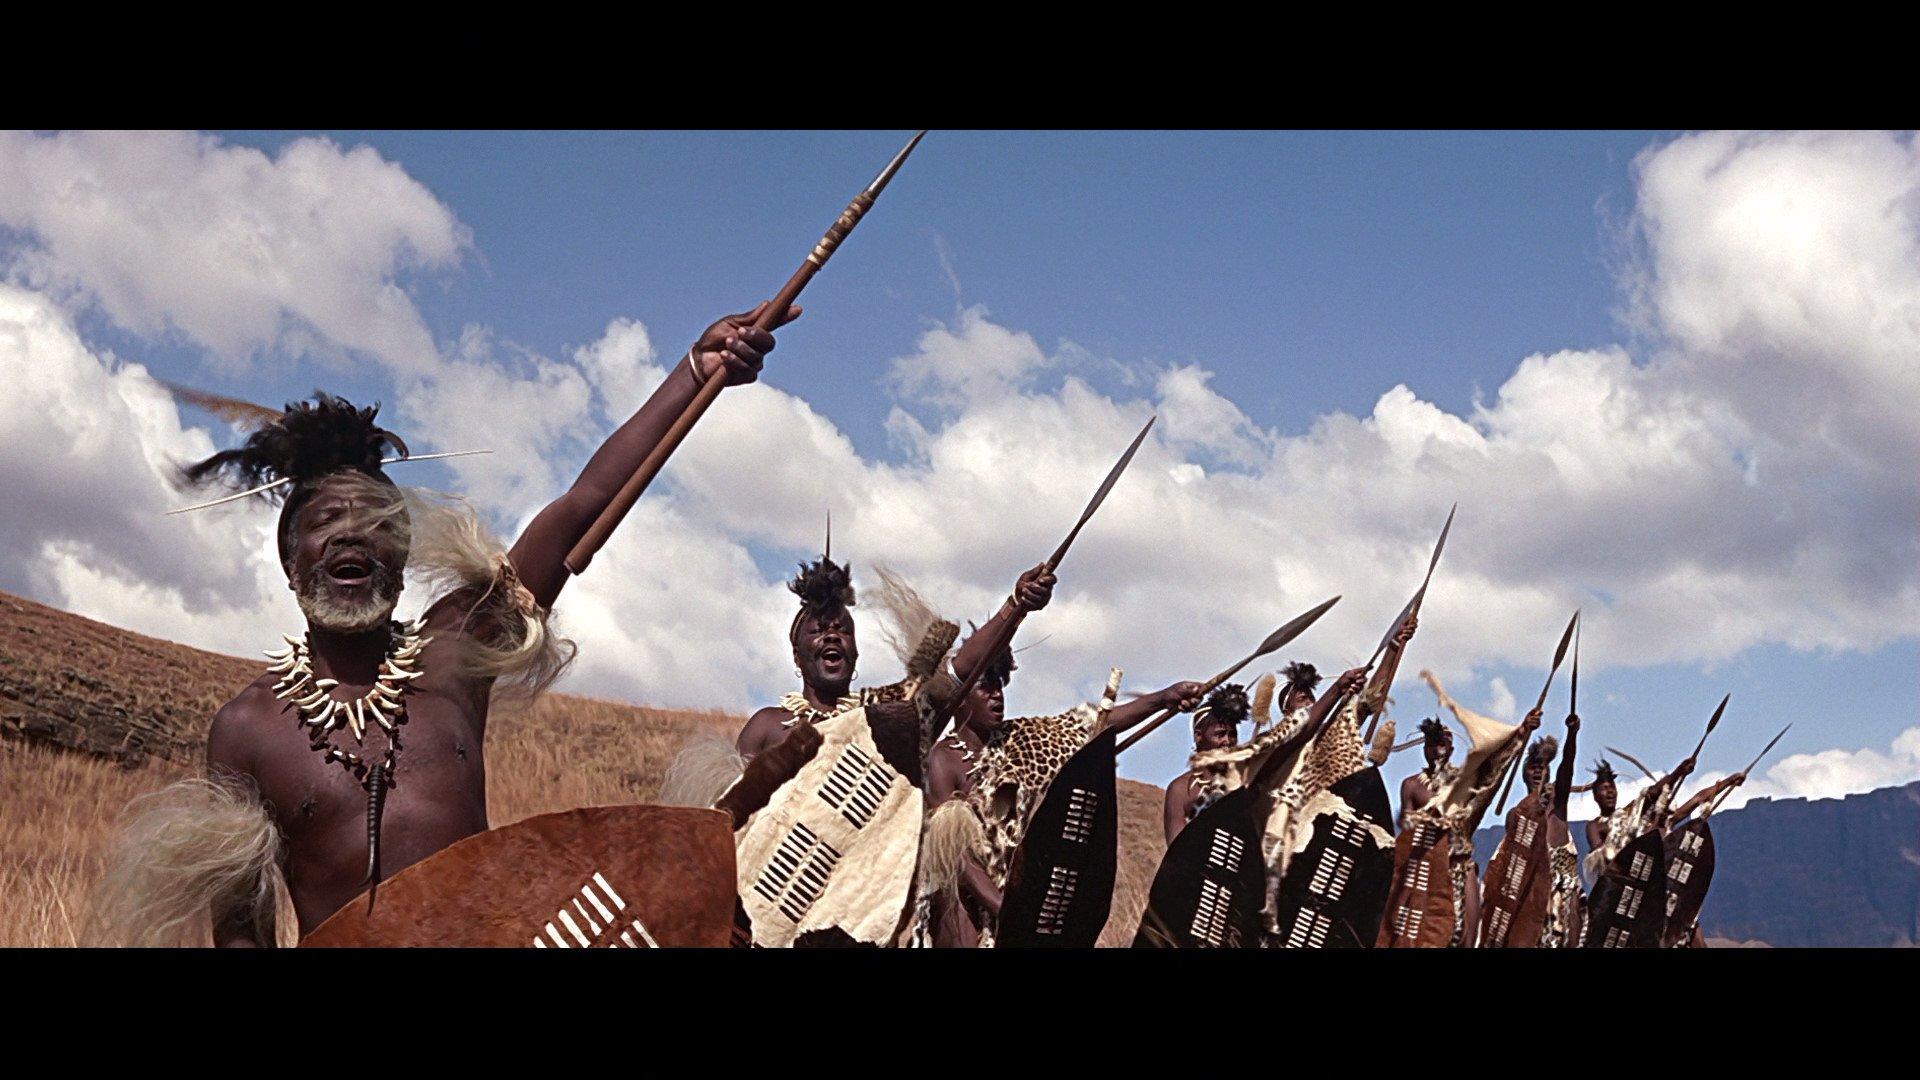 Zulu Theme Song Movie Theme Songs TV Soundtracks 1920x1080